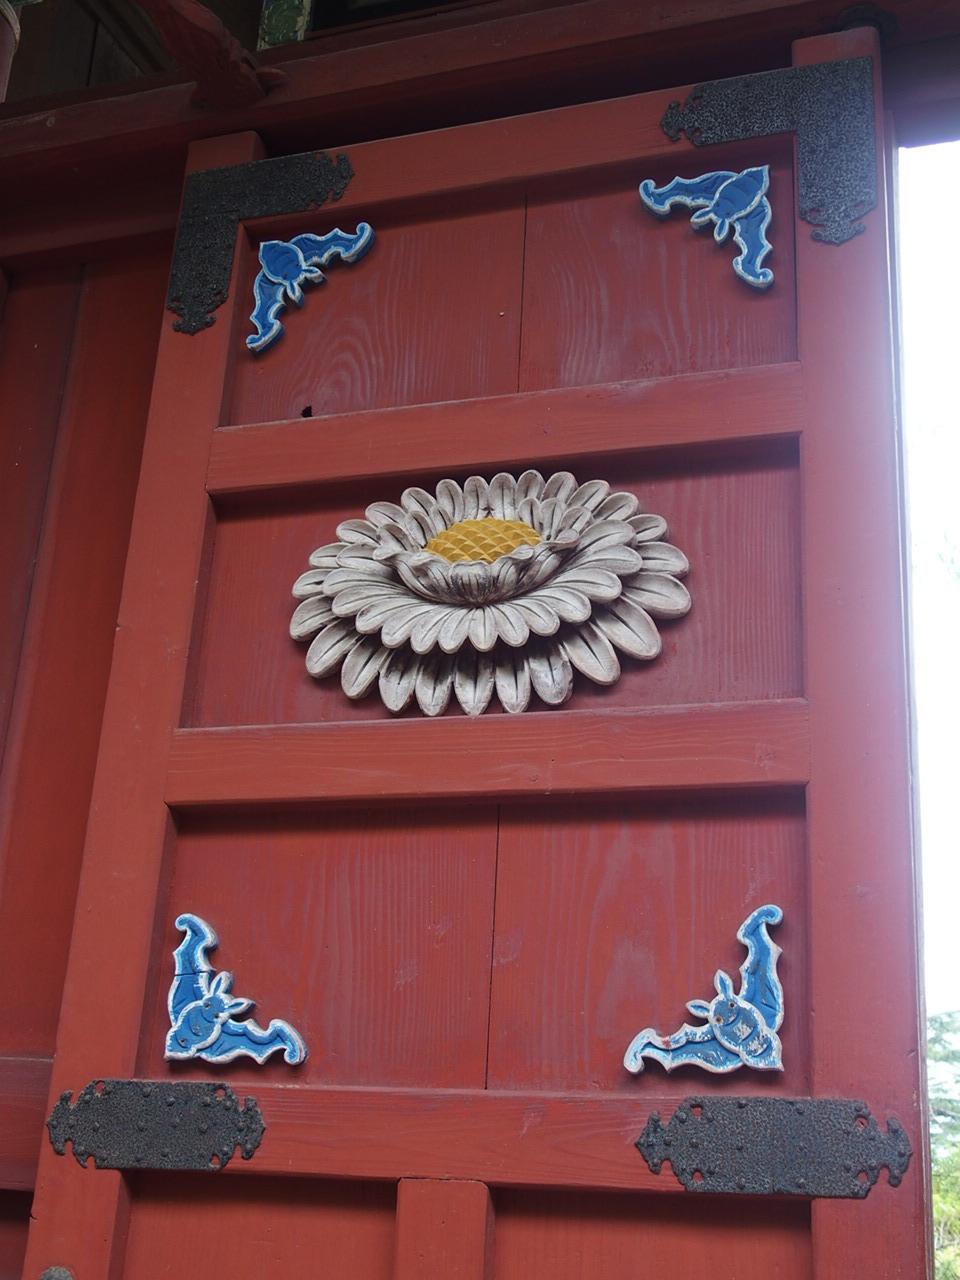 長崎の崇福寺の国宝第一峰門